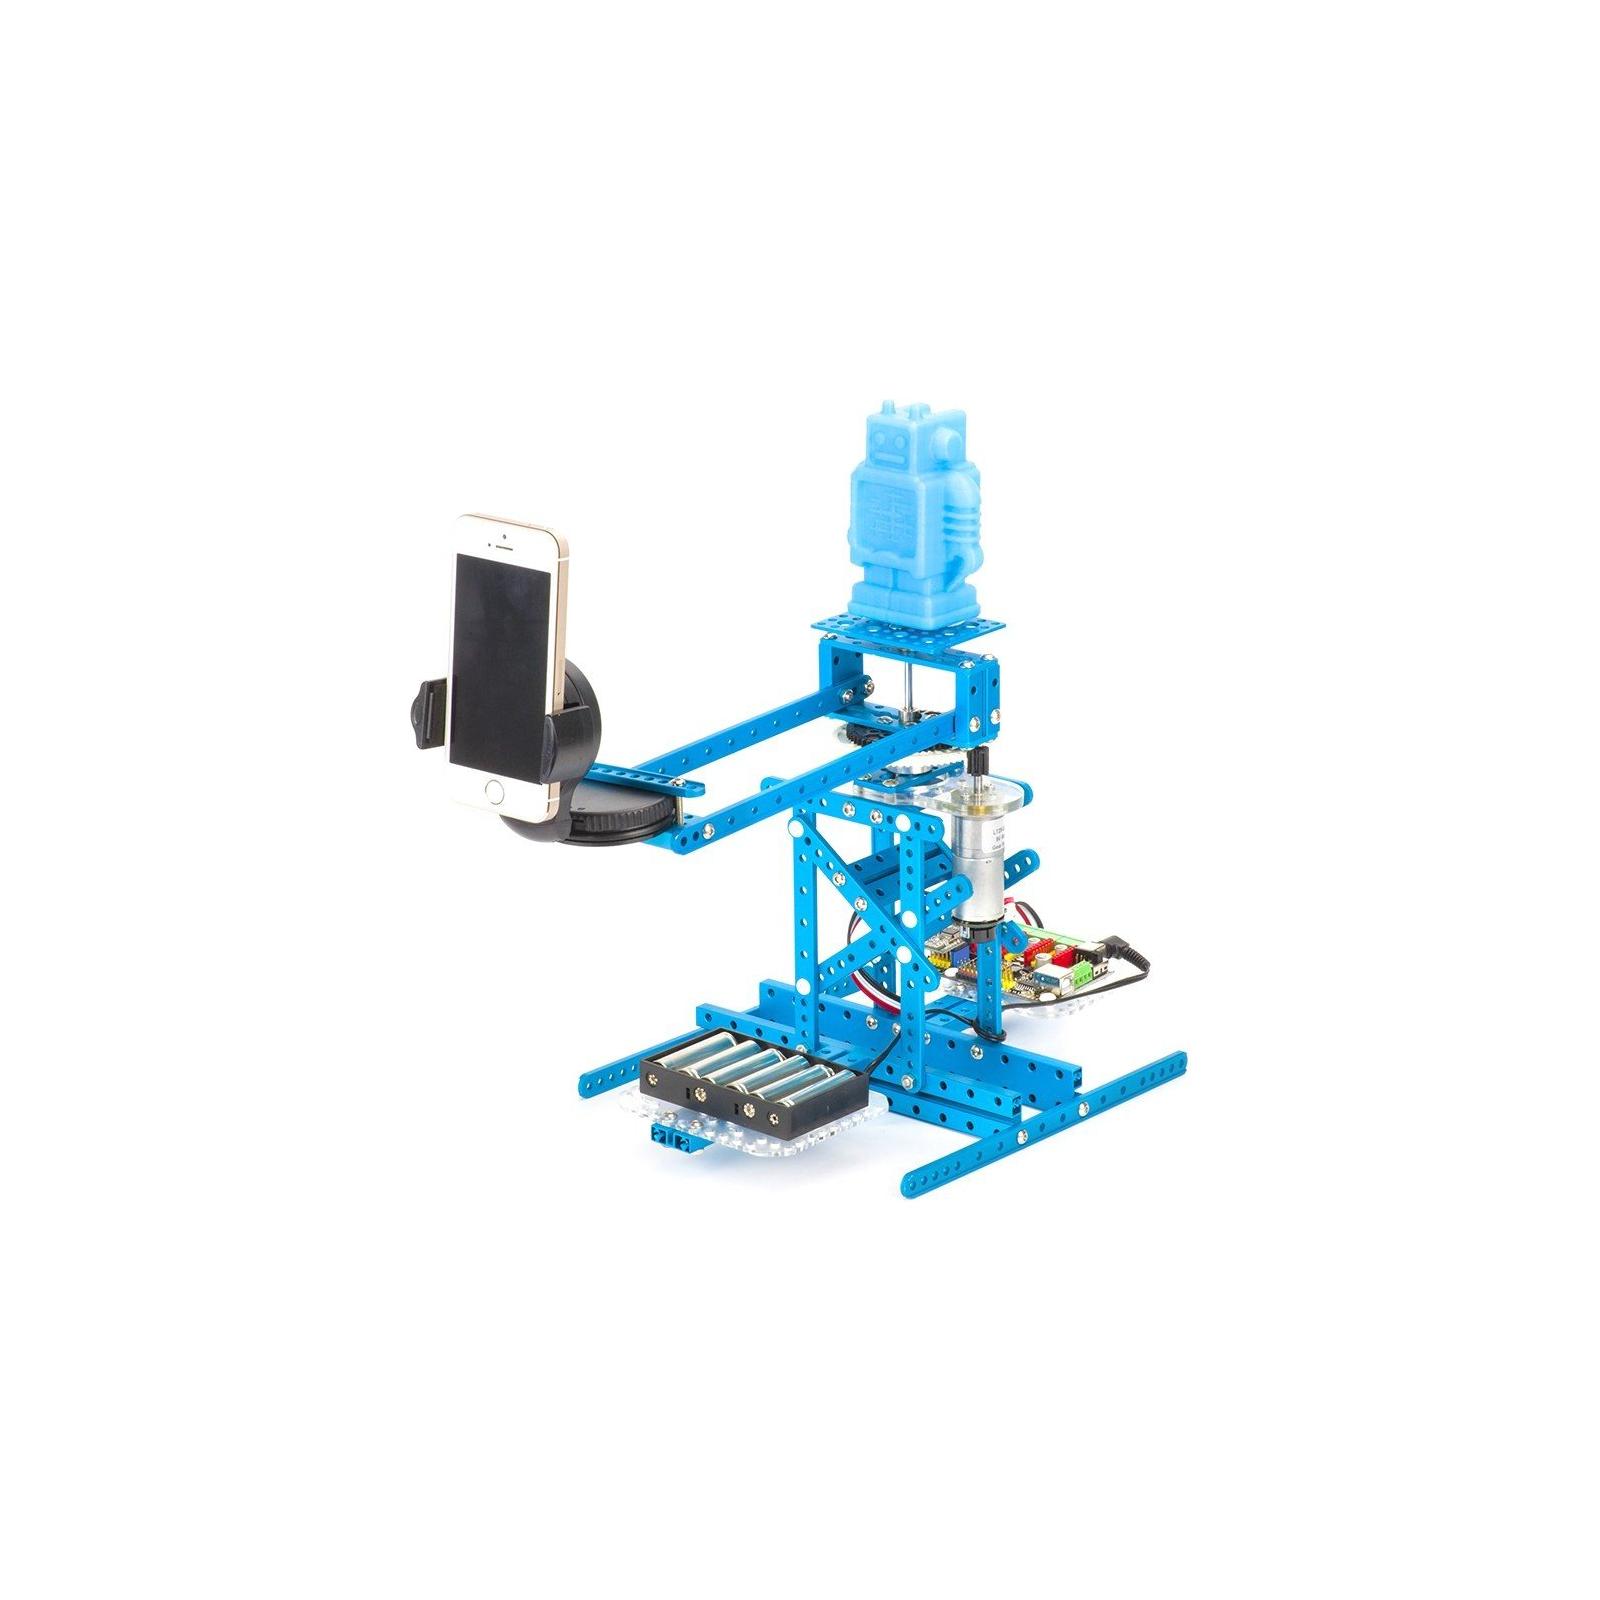 Робот Makeblock Ultimate v2.0 Robot Kit (09.00.40) изображение 10